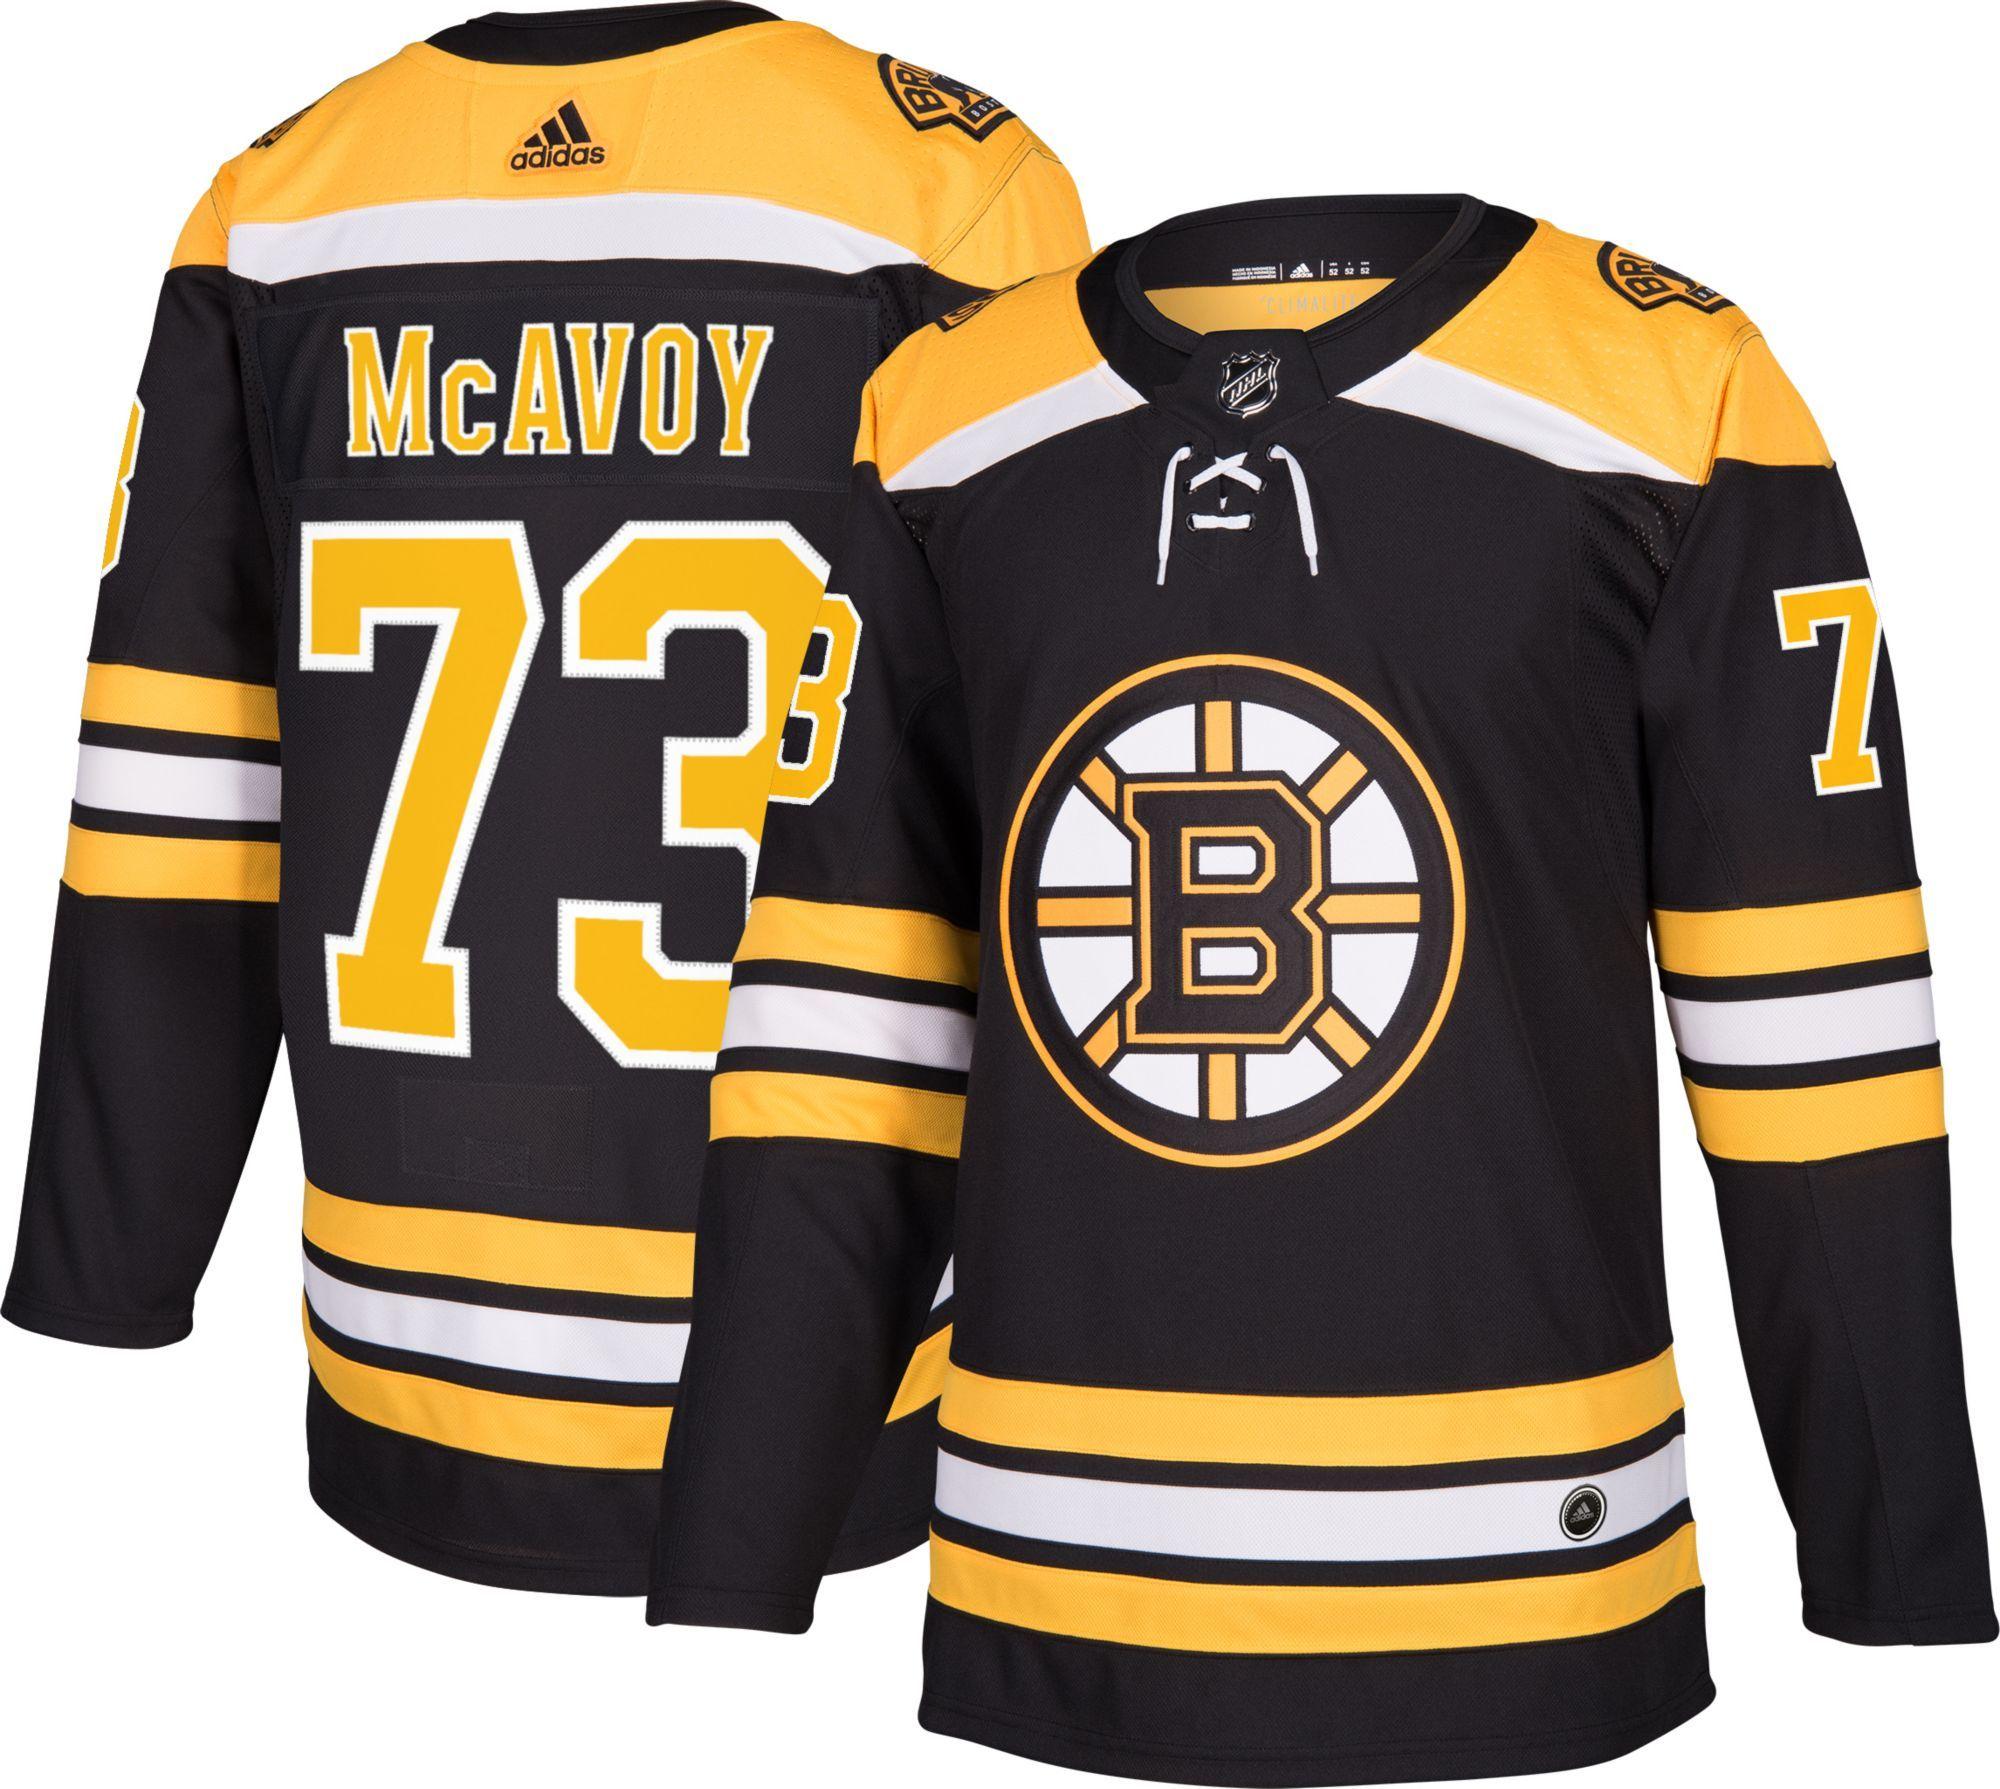 save off 9988e cc133 adidas Men's Boston Bruins Charlie McAvoy #73 Authentic Pro ...